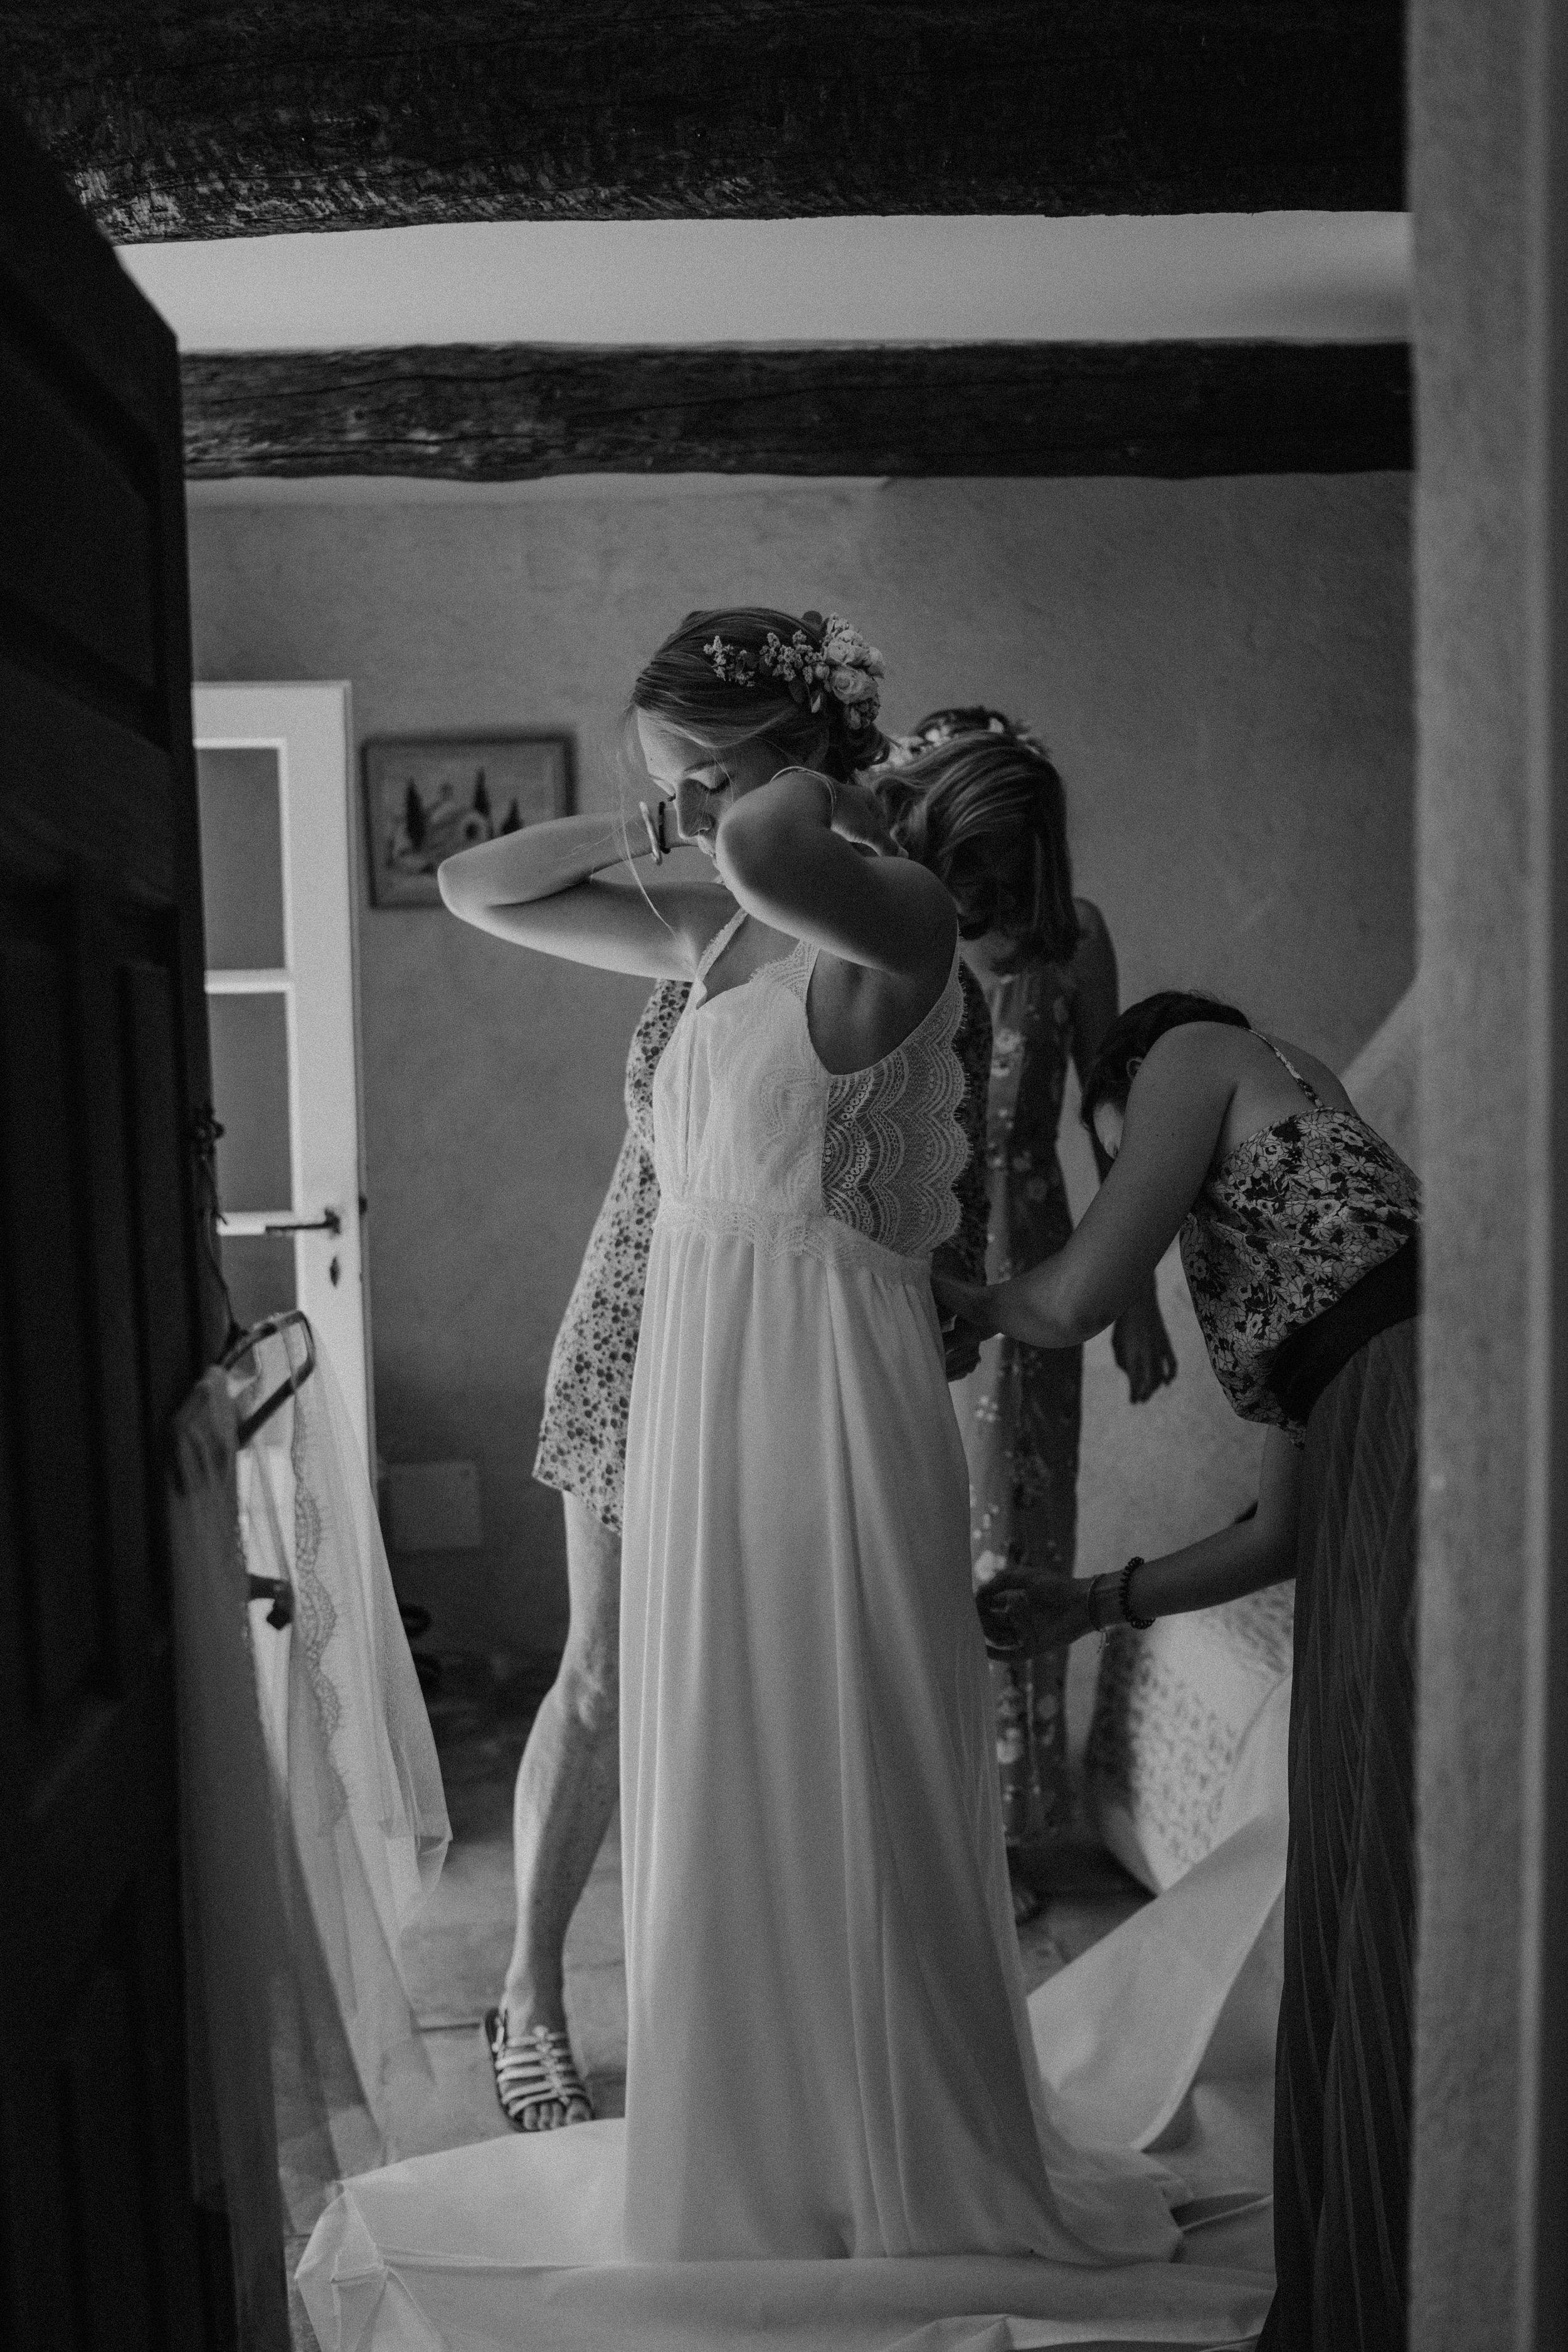 elsacaza_photographe_mariage_Juliette_Nicolas-53.jpg